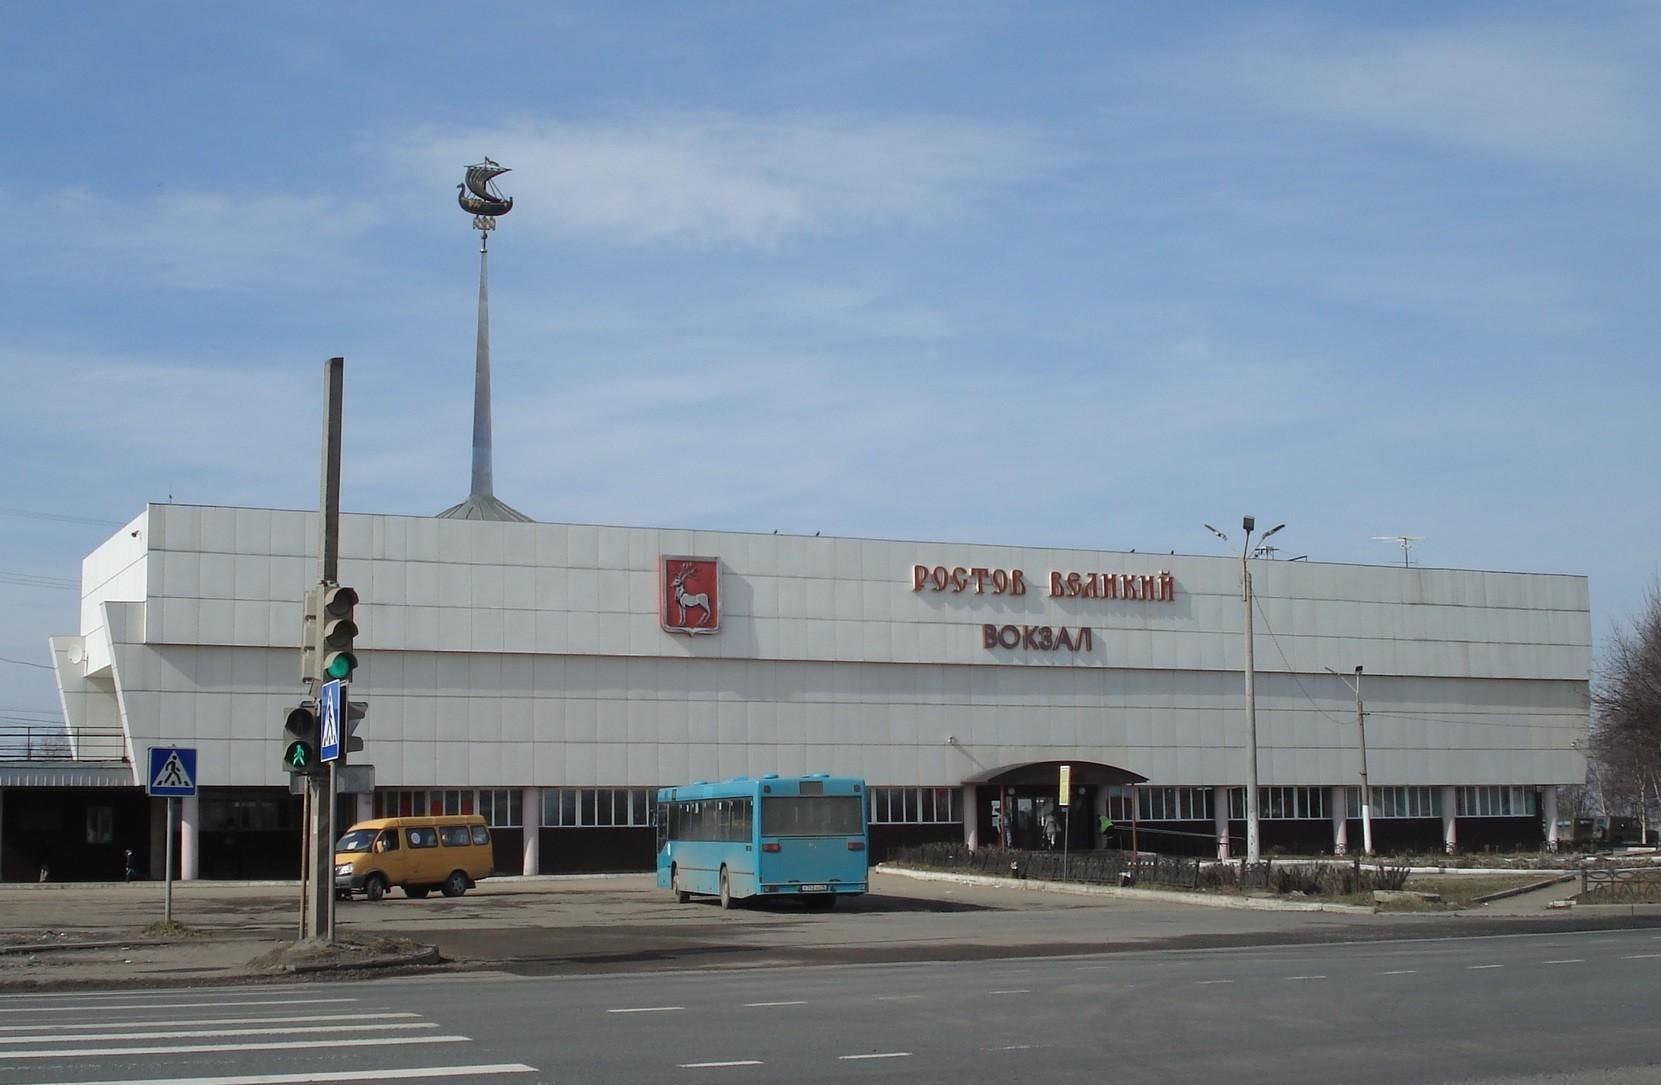 Arriving to Rostov Veliky | Golden Ring | Moscow